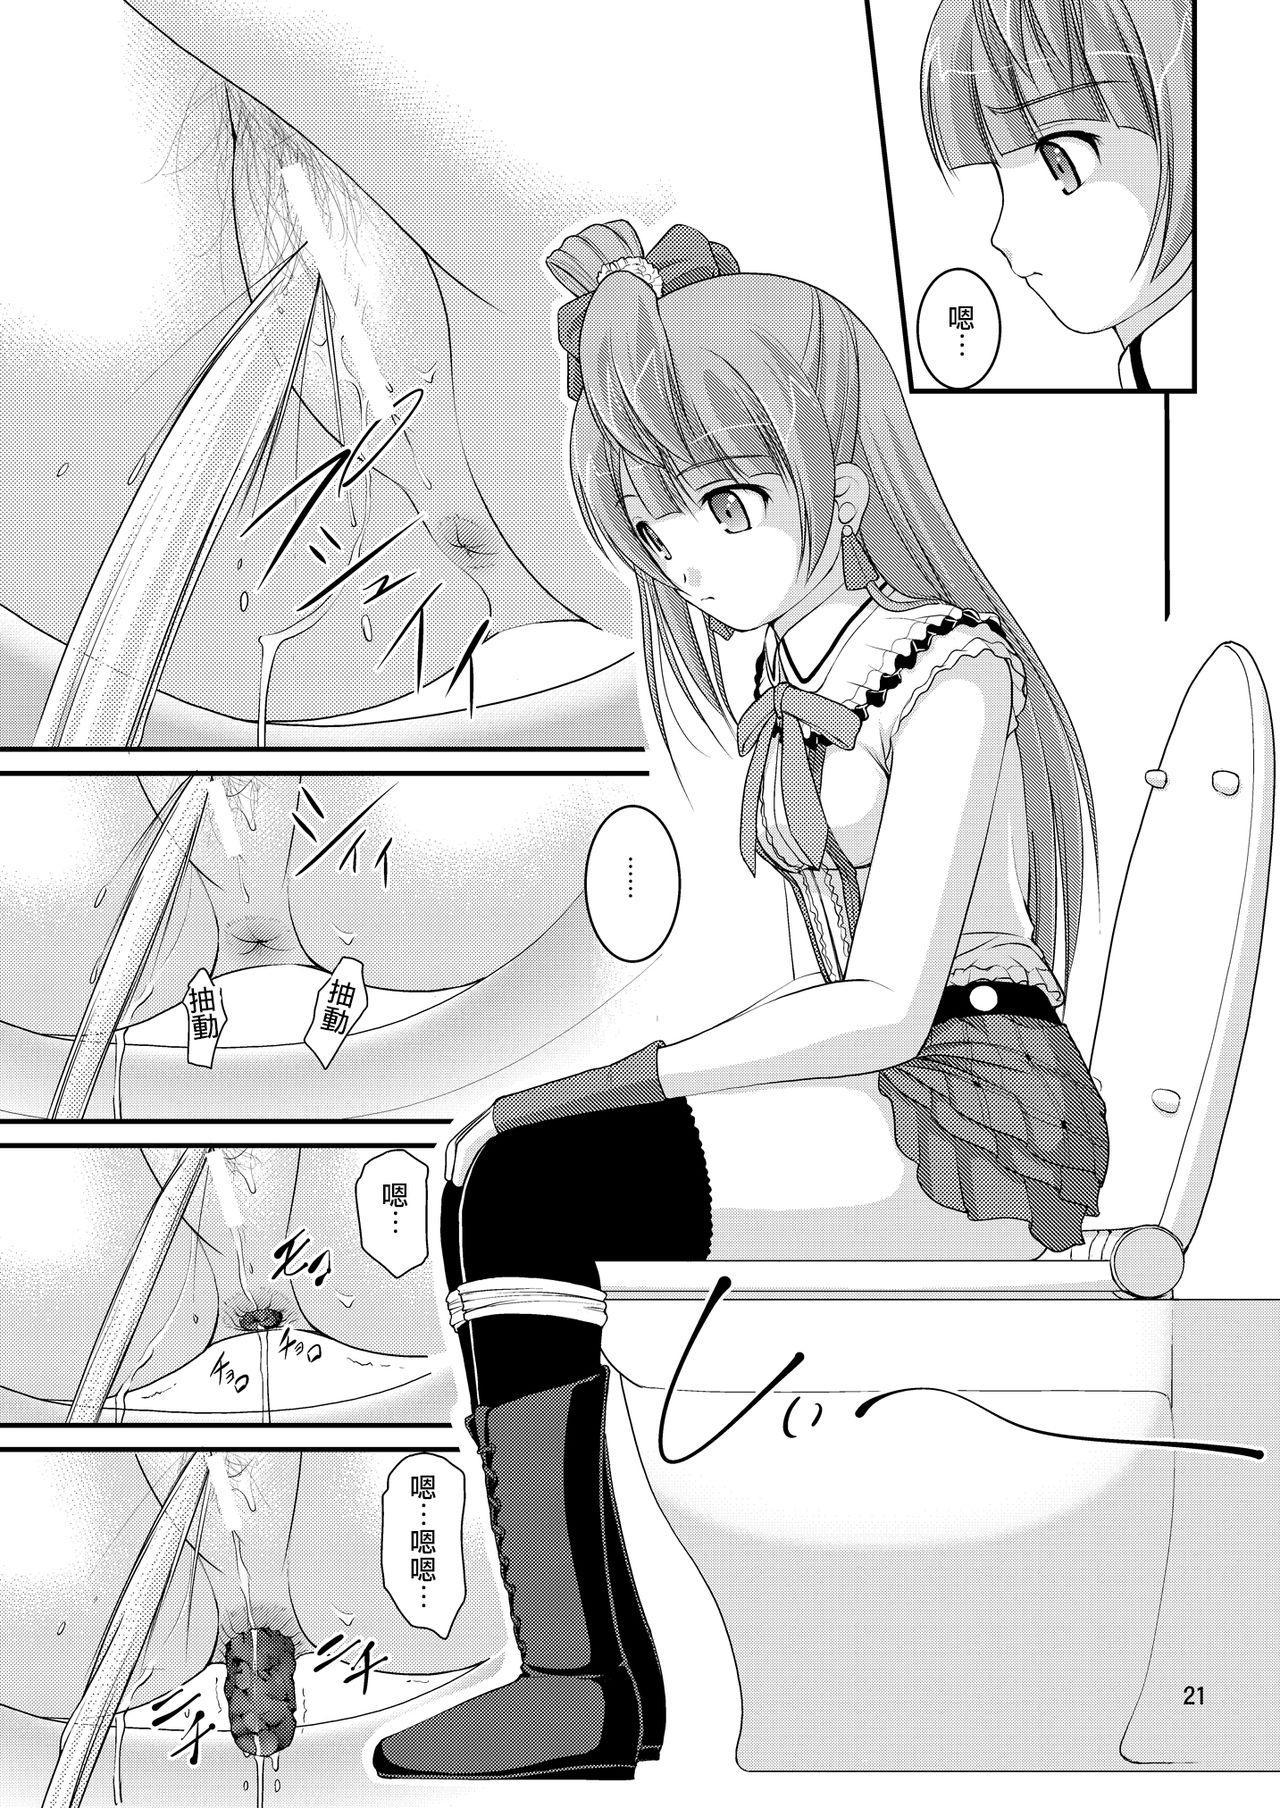 Bou Ninki School Idol Toilet Tousatsu vol. 1   某人氣學園偶像 廁所盜攝 Vol. 1 18